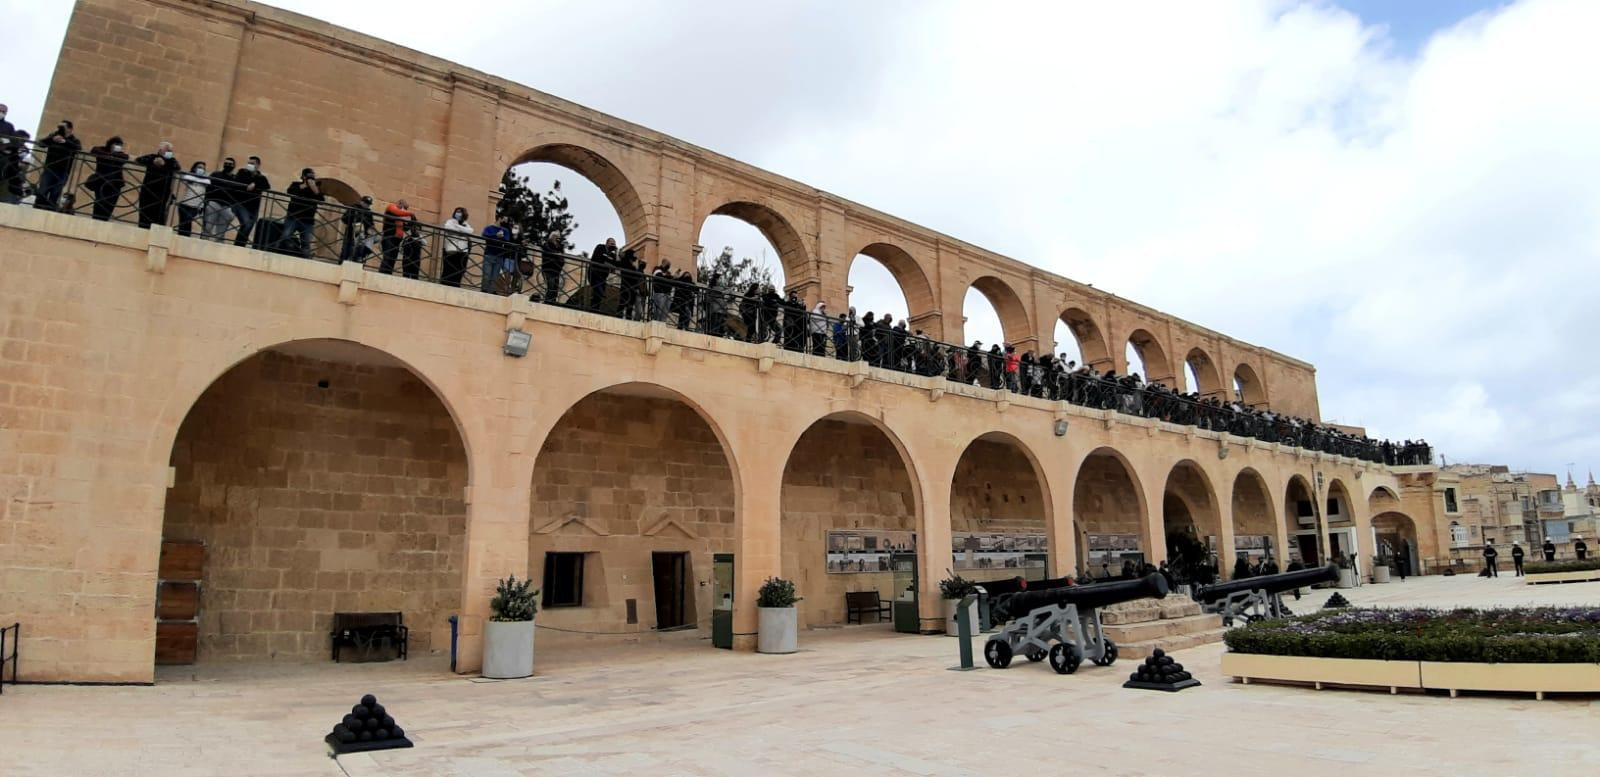 People gather at Upper Barrakka to witness the gun salute. Photo: Chris Sant Fournier